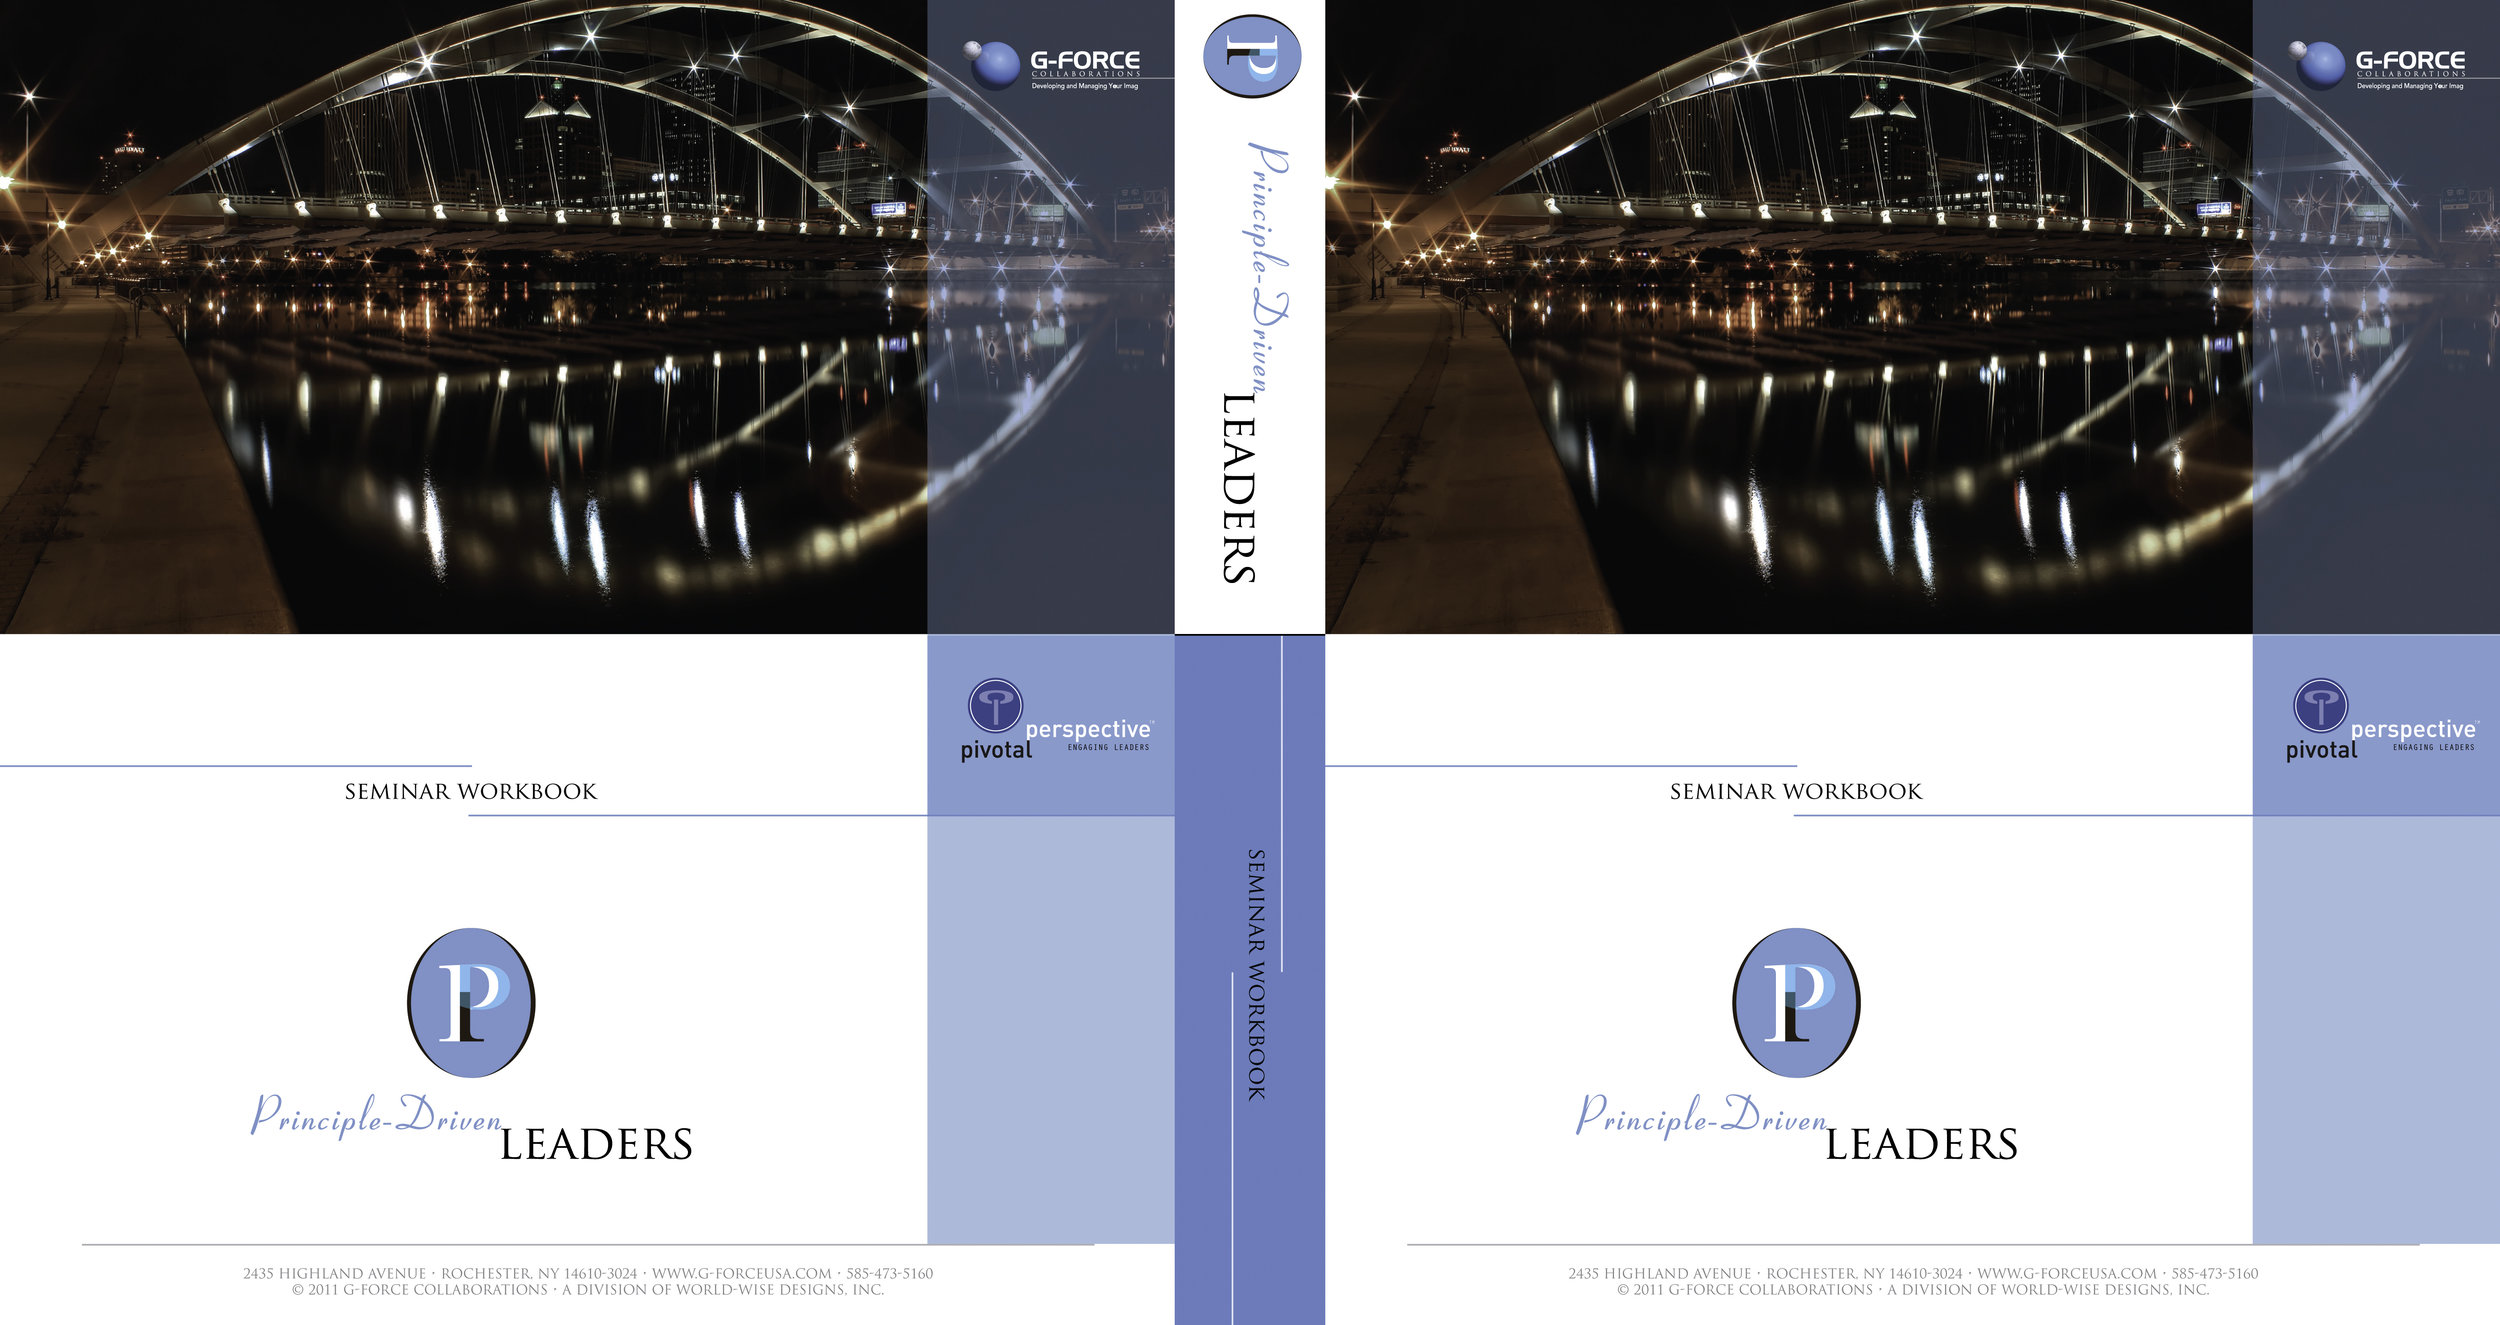 PDL Binder Cover.jpg